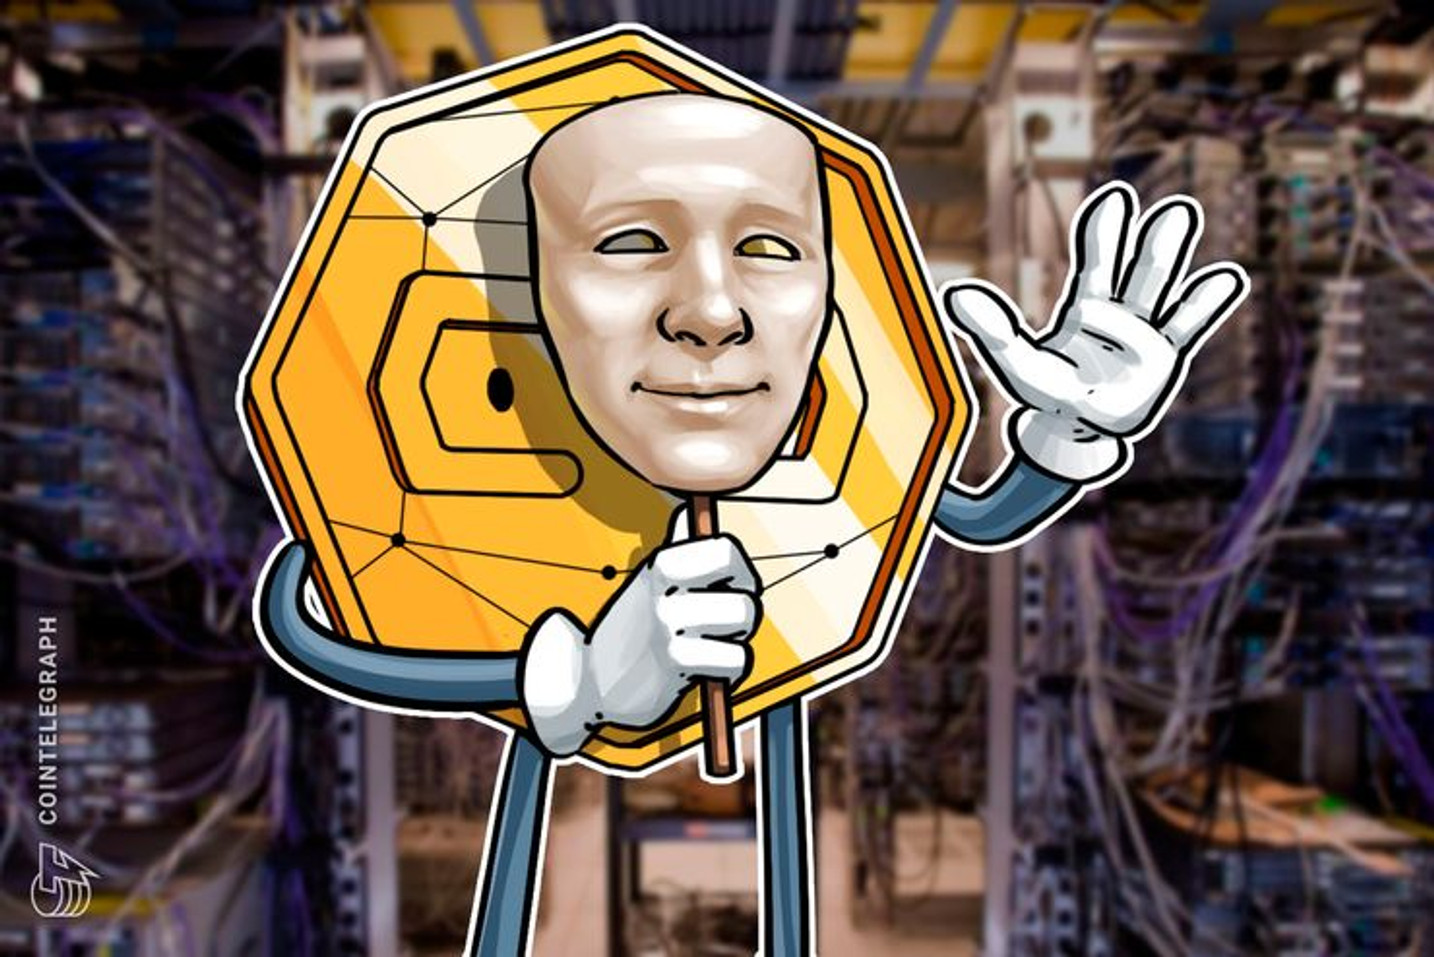 Investigada pela CVM, Investimento Bitcoin muda de nome na Junta Comercial